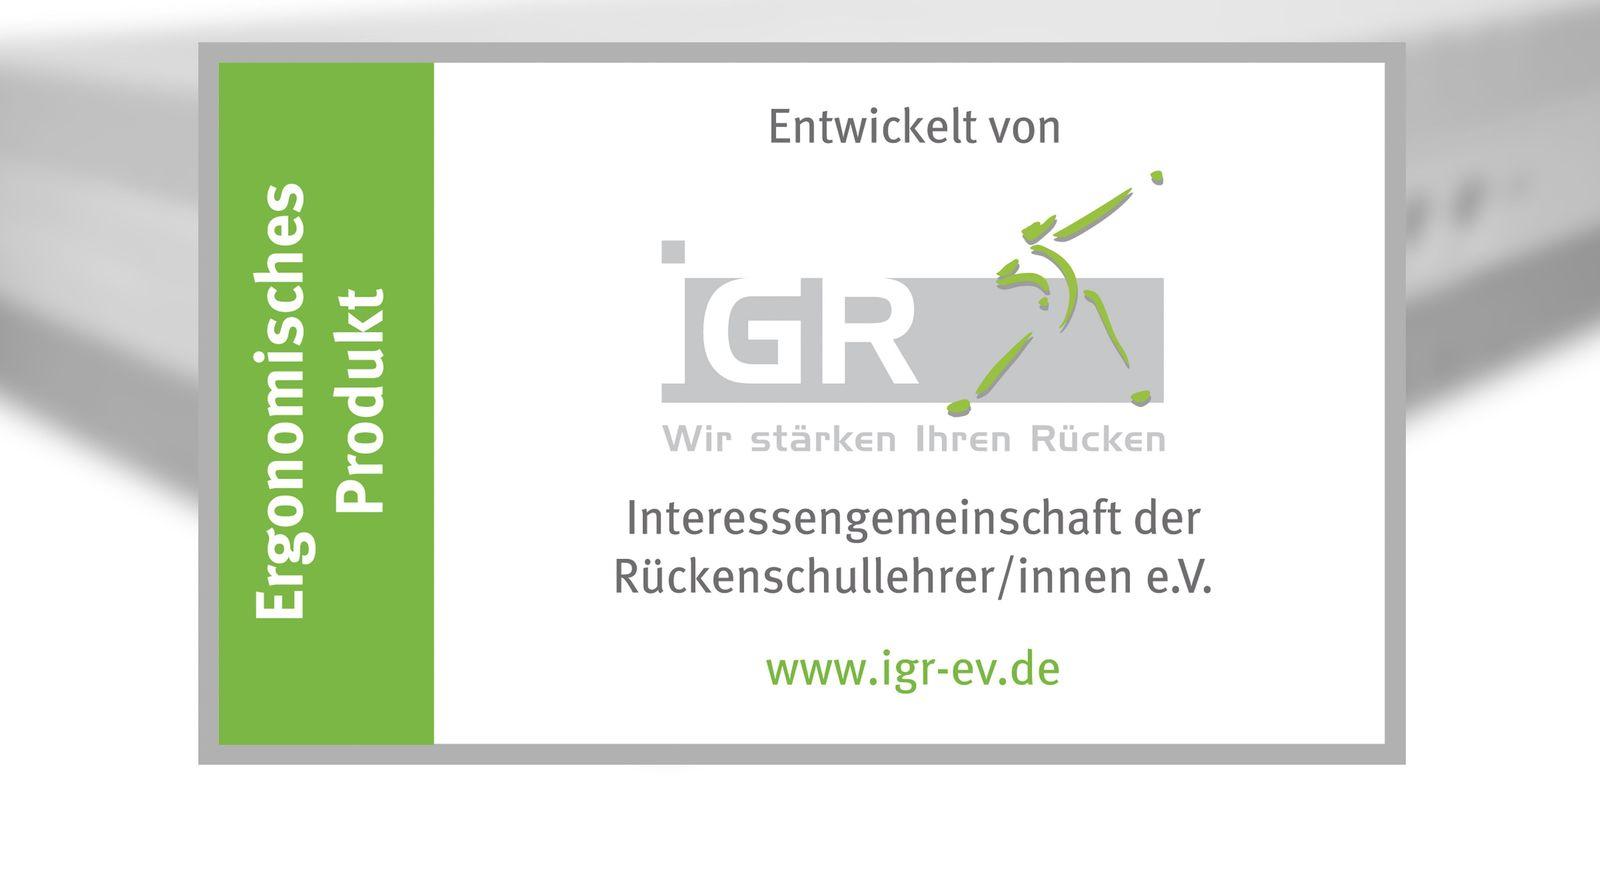 YouSleep Matratzen mit IGR-Siegel